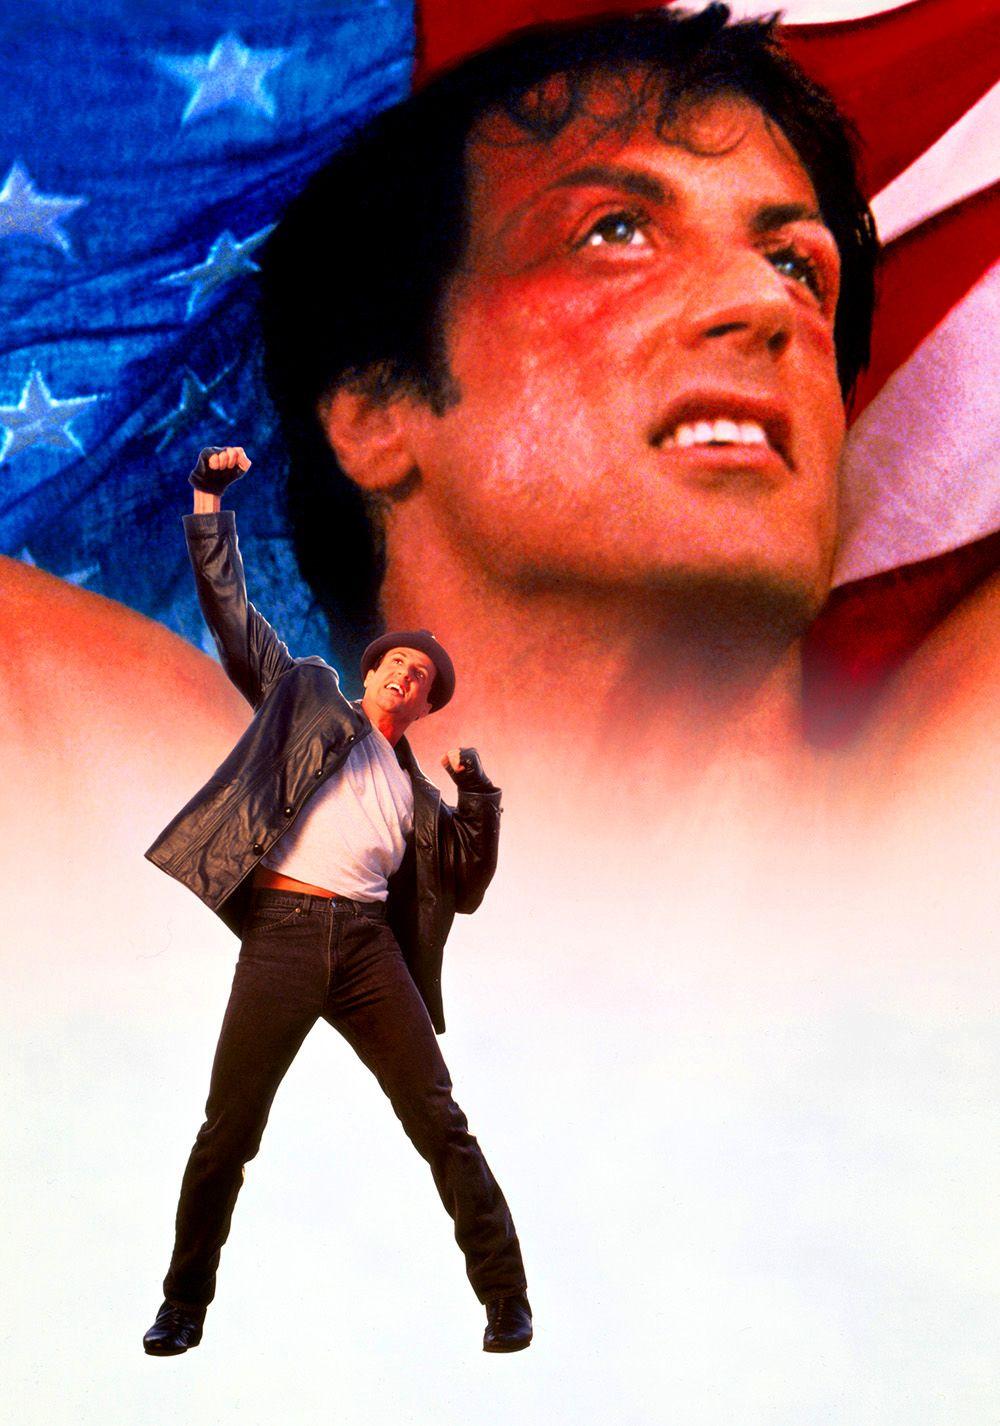 Rocky Balboa Coloring Page : rocky, balboa, coloring, Rocky, Balboa, Balboa,, Stallone,, Sylvester, Stallone